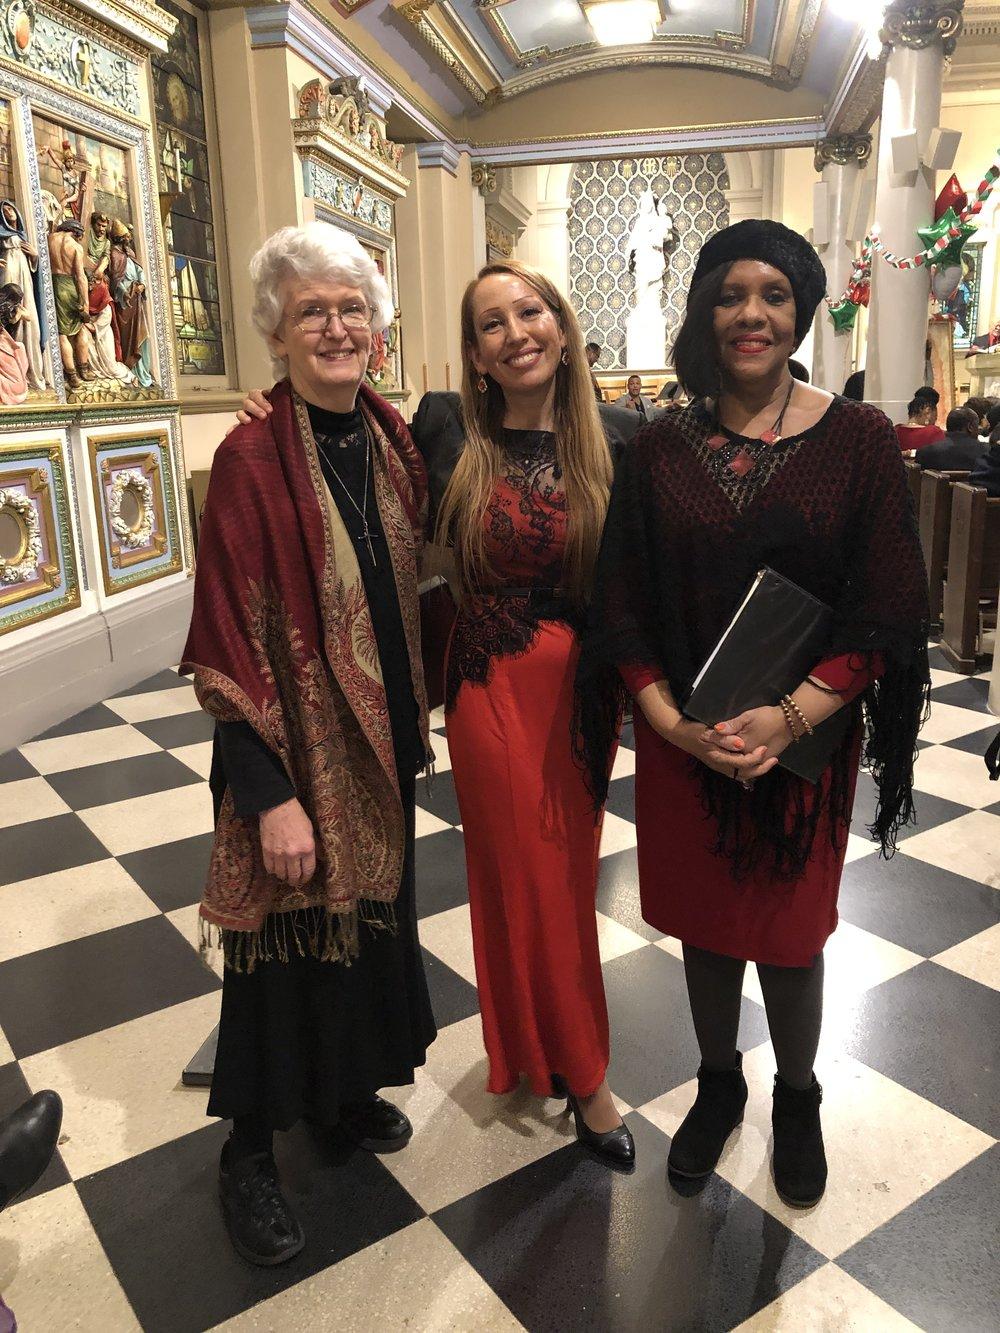 IMG_2336-mark-howell-singers-saint-francis-de-sales-church-sing-joy-adult-choir-gospel-new-york-city.jpg